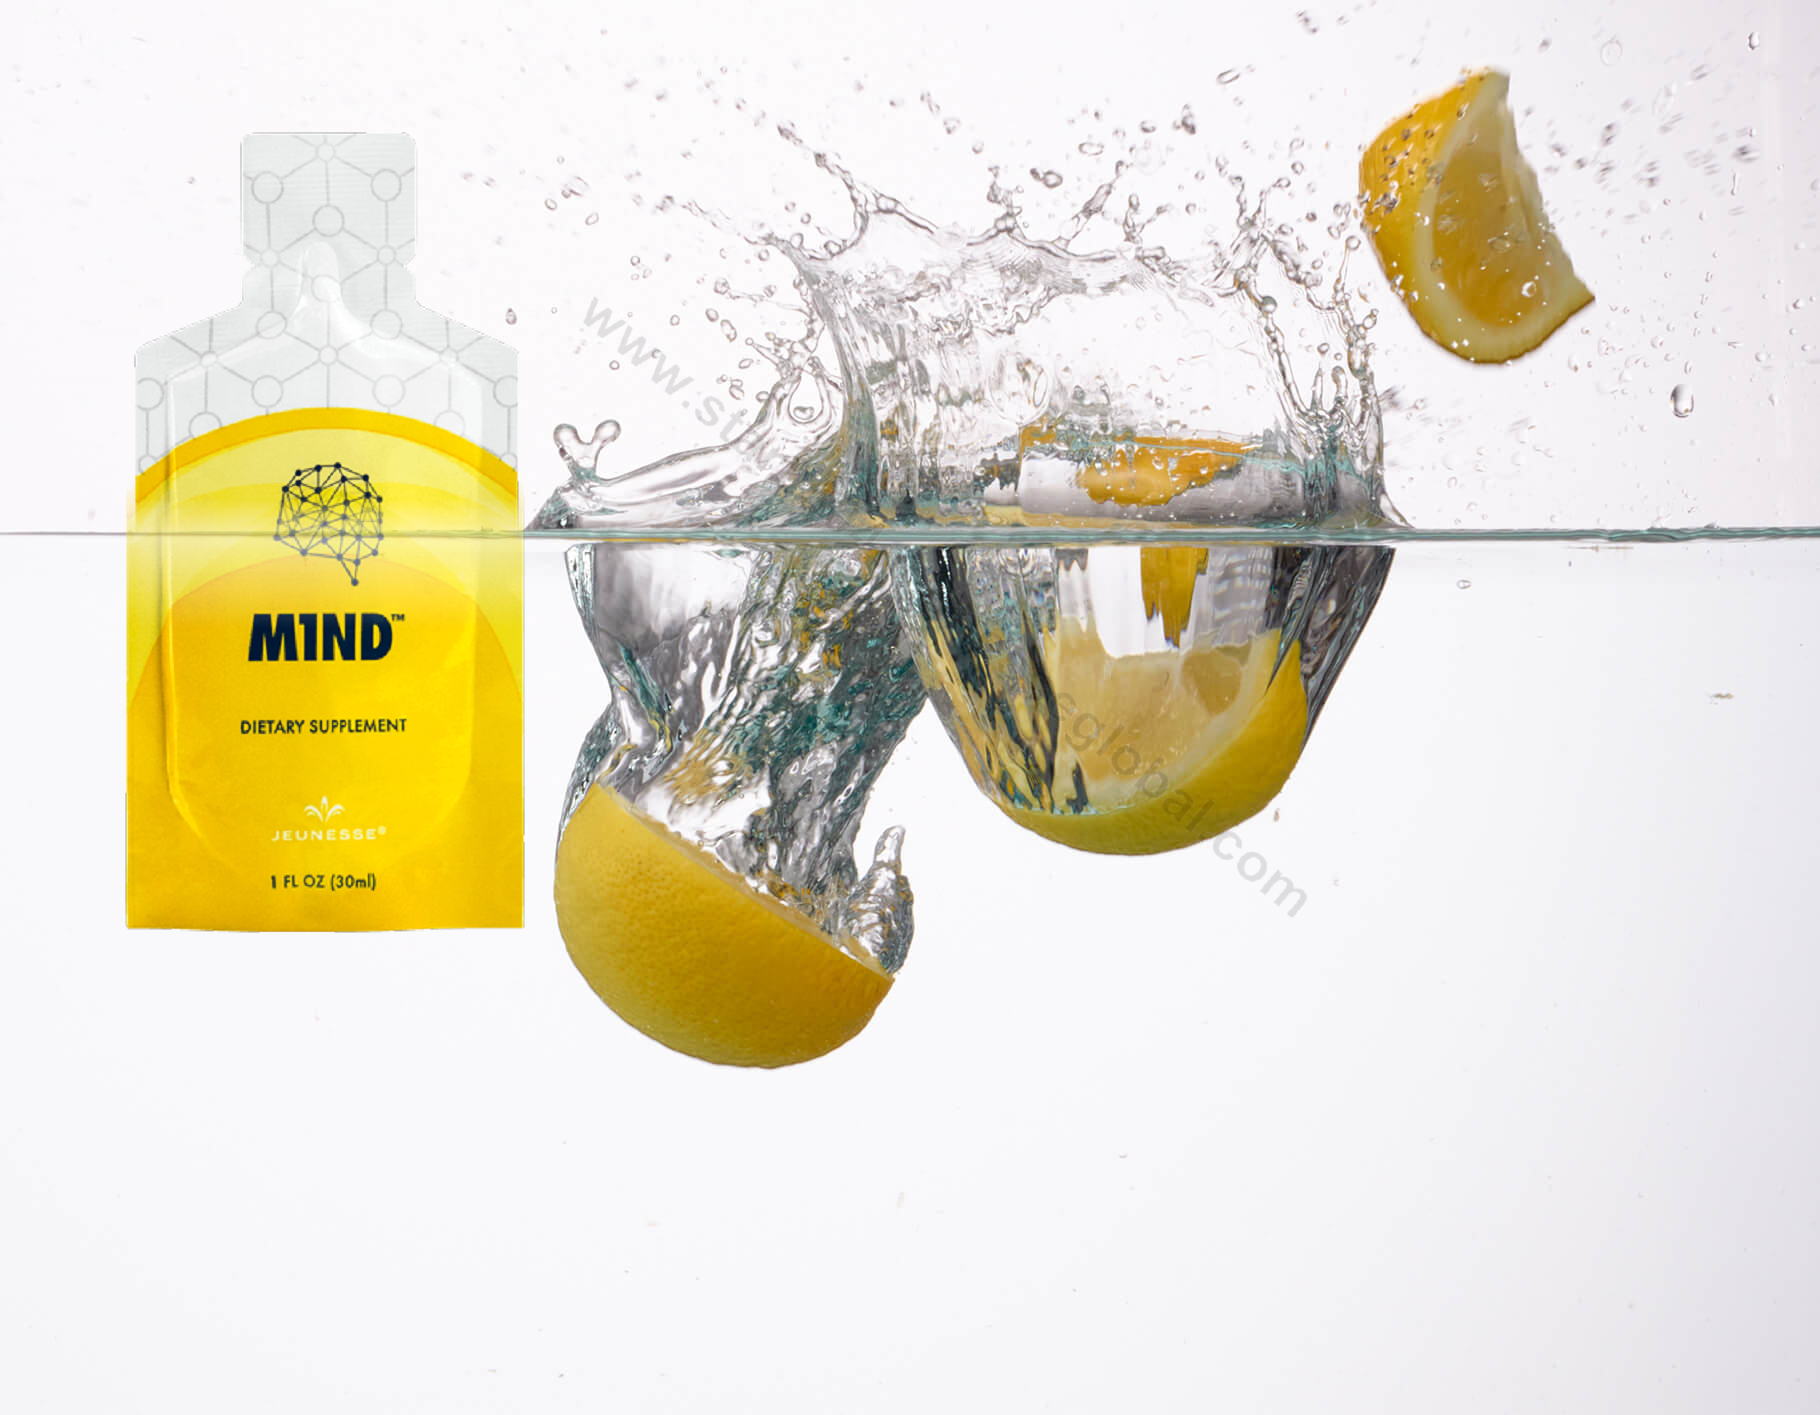 jeunesse-m1nd-lemons-f.jpg